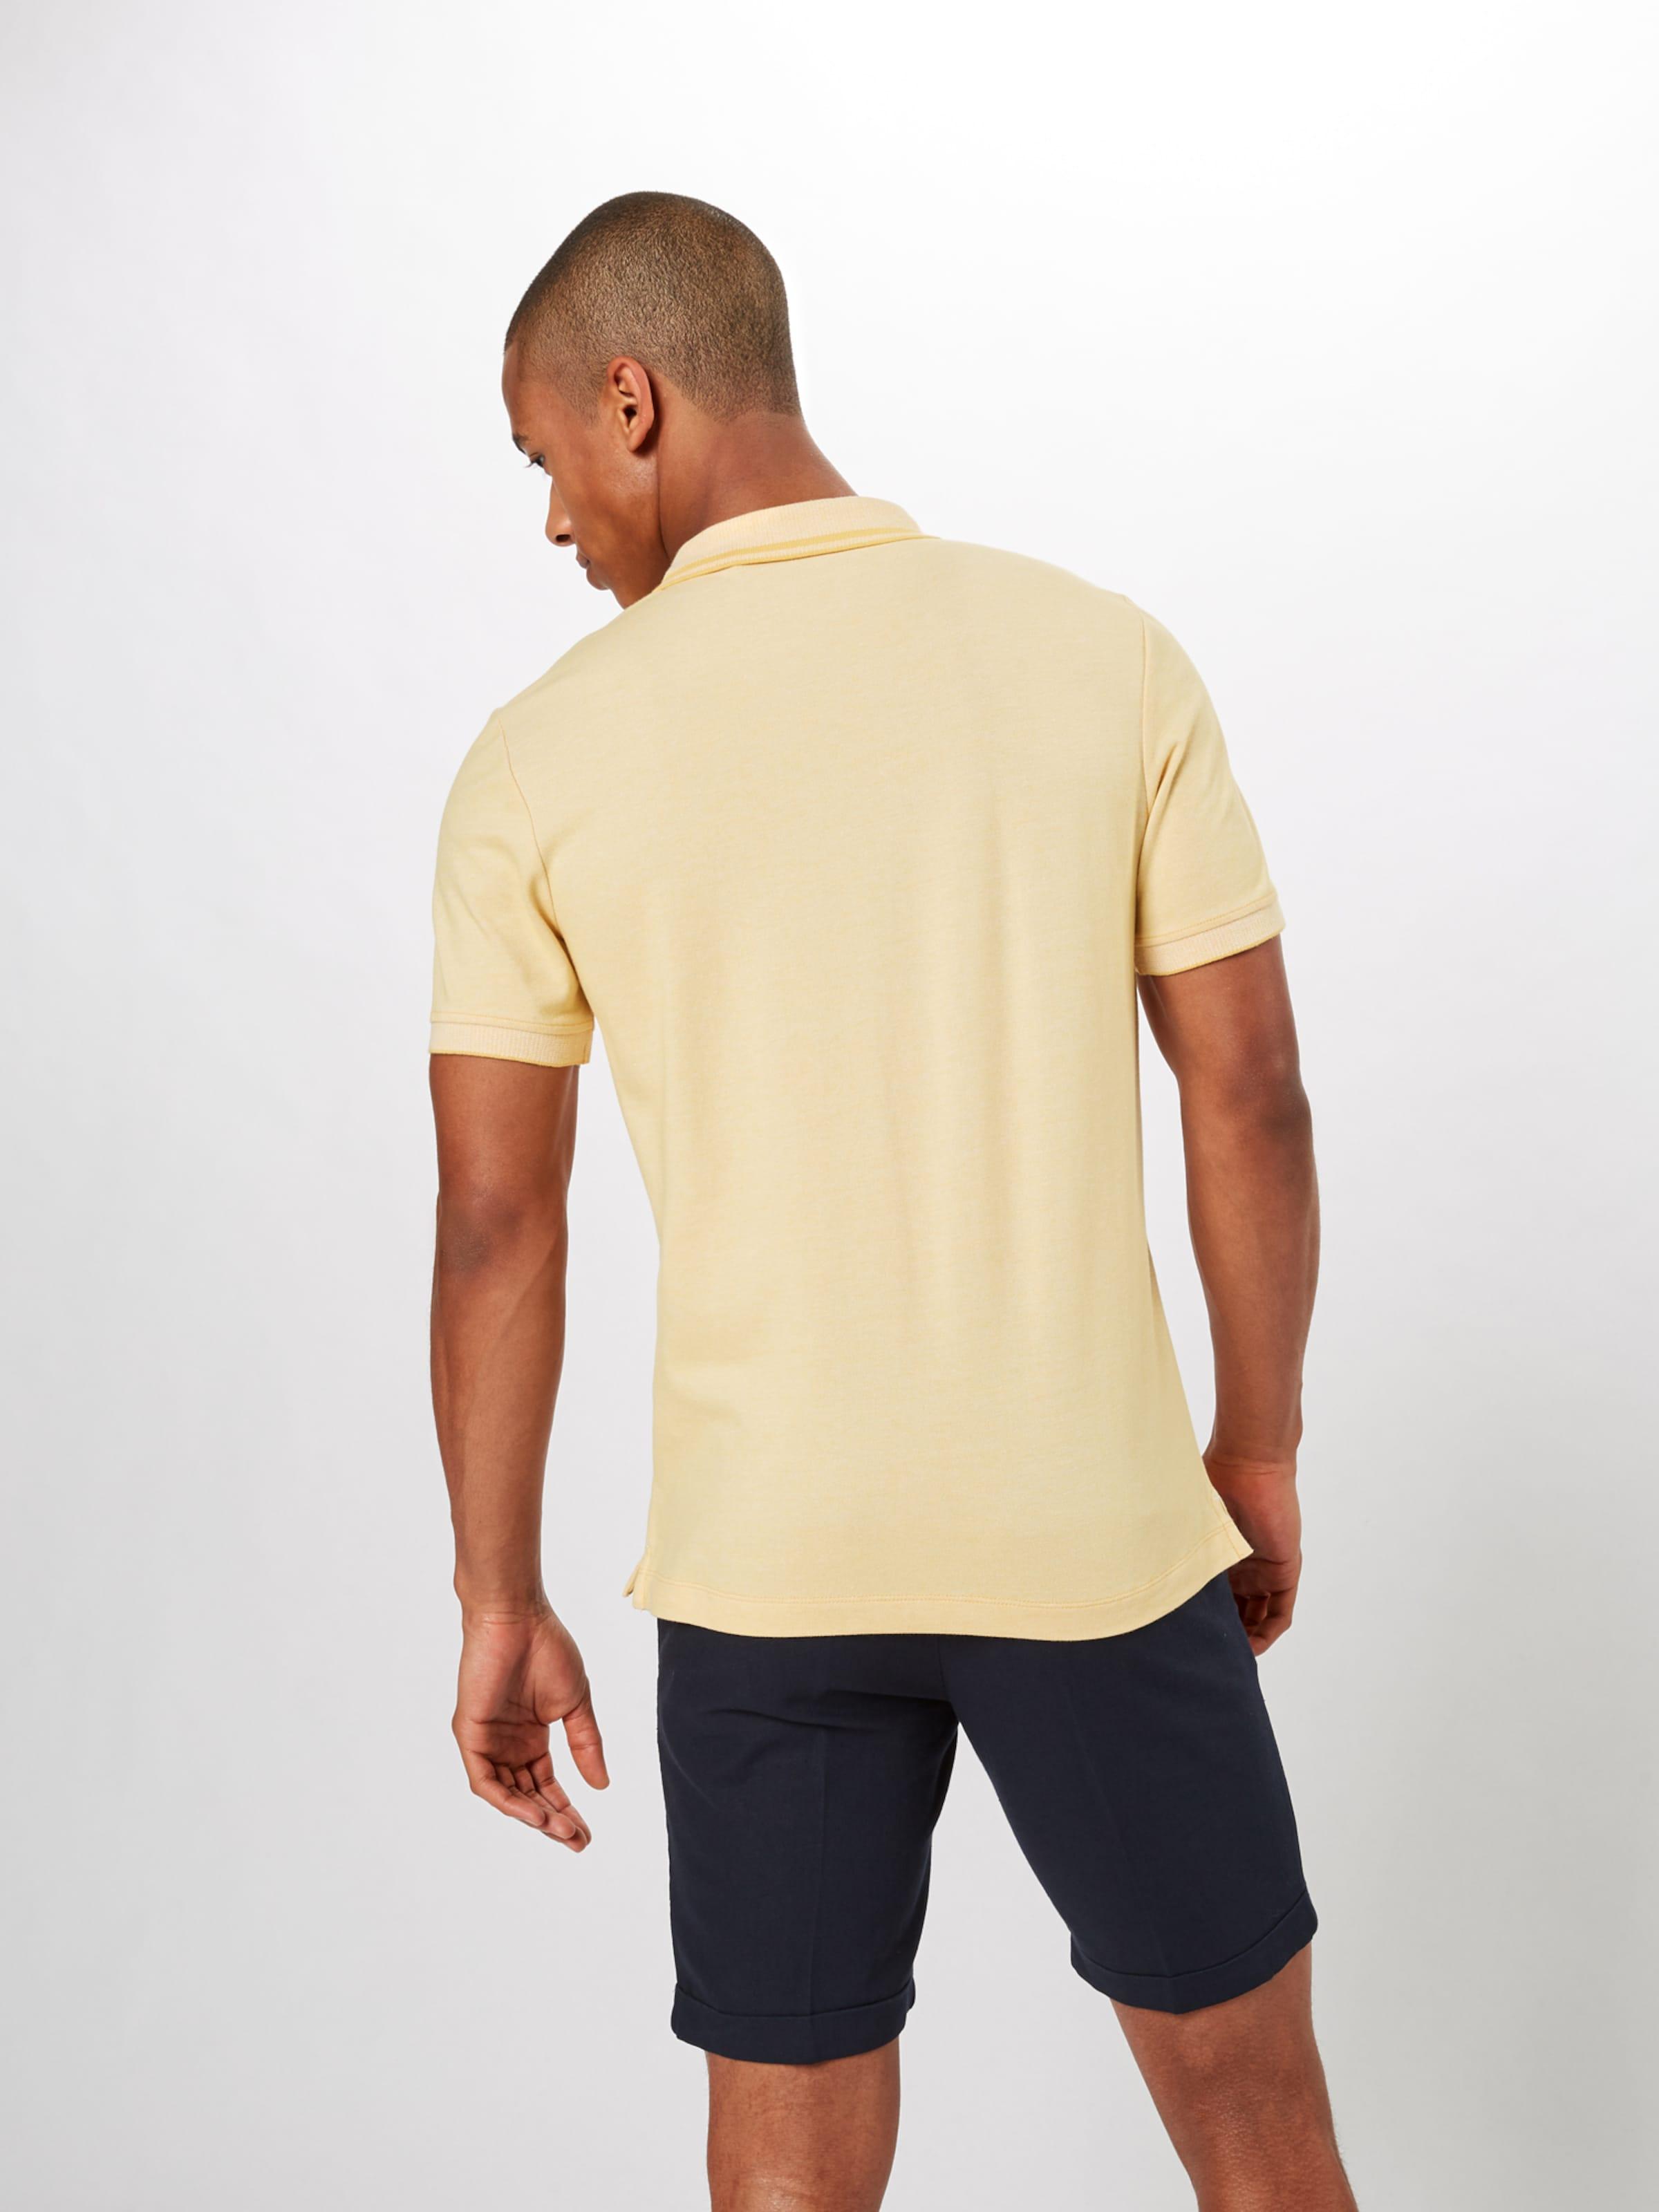 Label Lc1fjk T Red Jaune Oliver En S Shirt nPXN8wZ0Ok